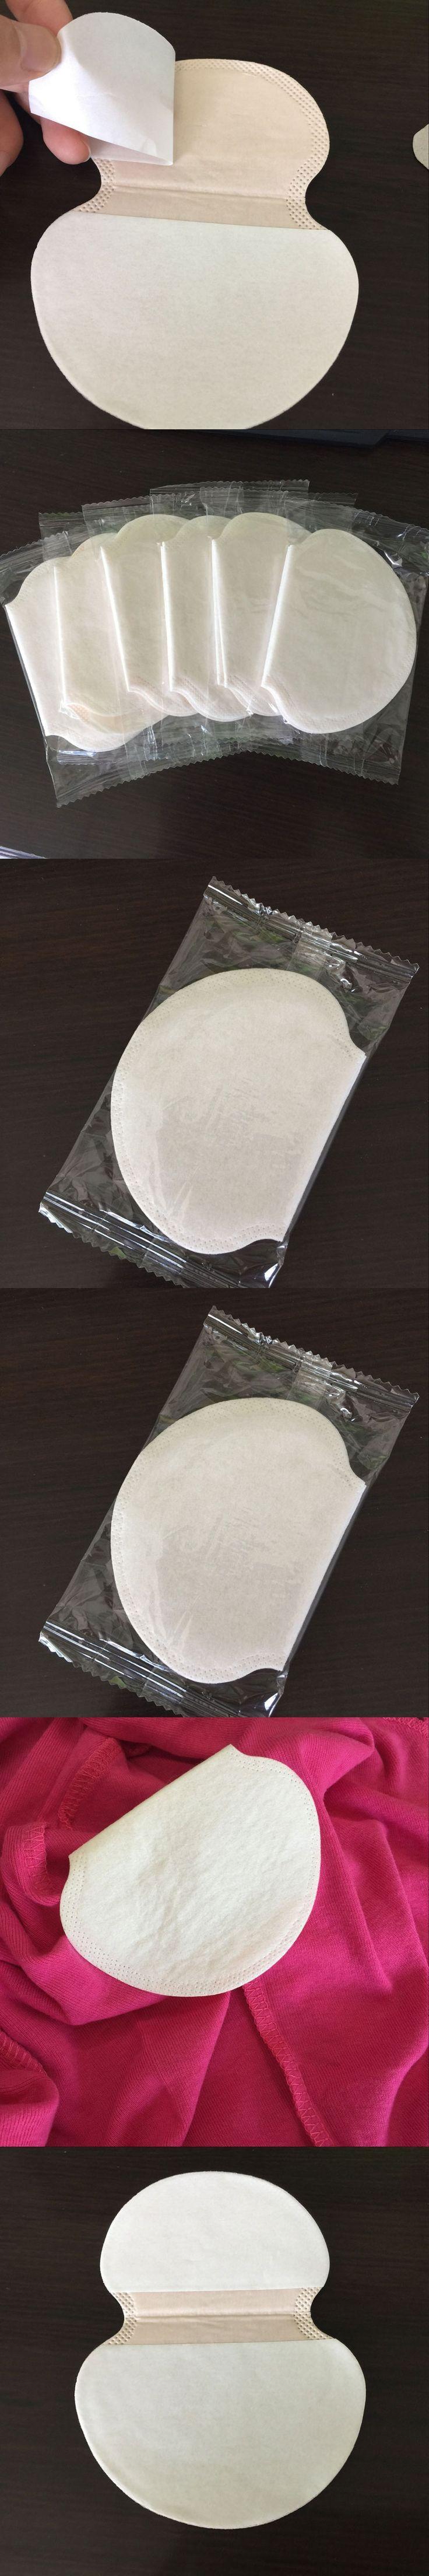 50pcs Disposable Underarm Sweat Pad Armpit Guard Sheet Liner Dress Clothing Shield Antiperspirant Pads Sweating Hot Sale